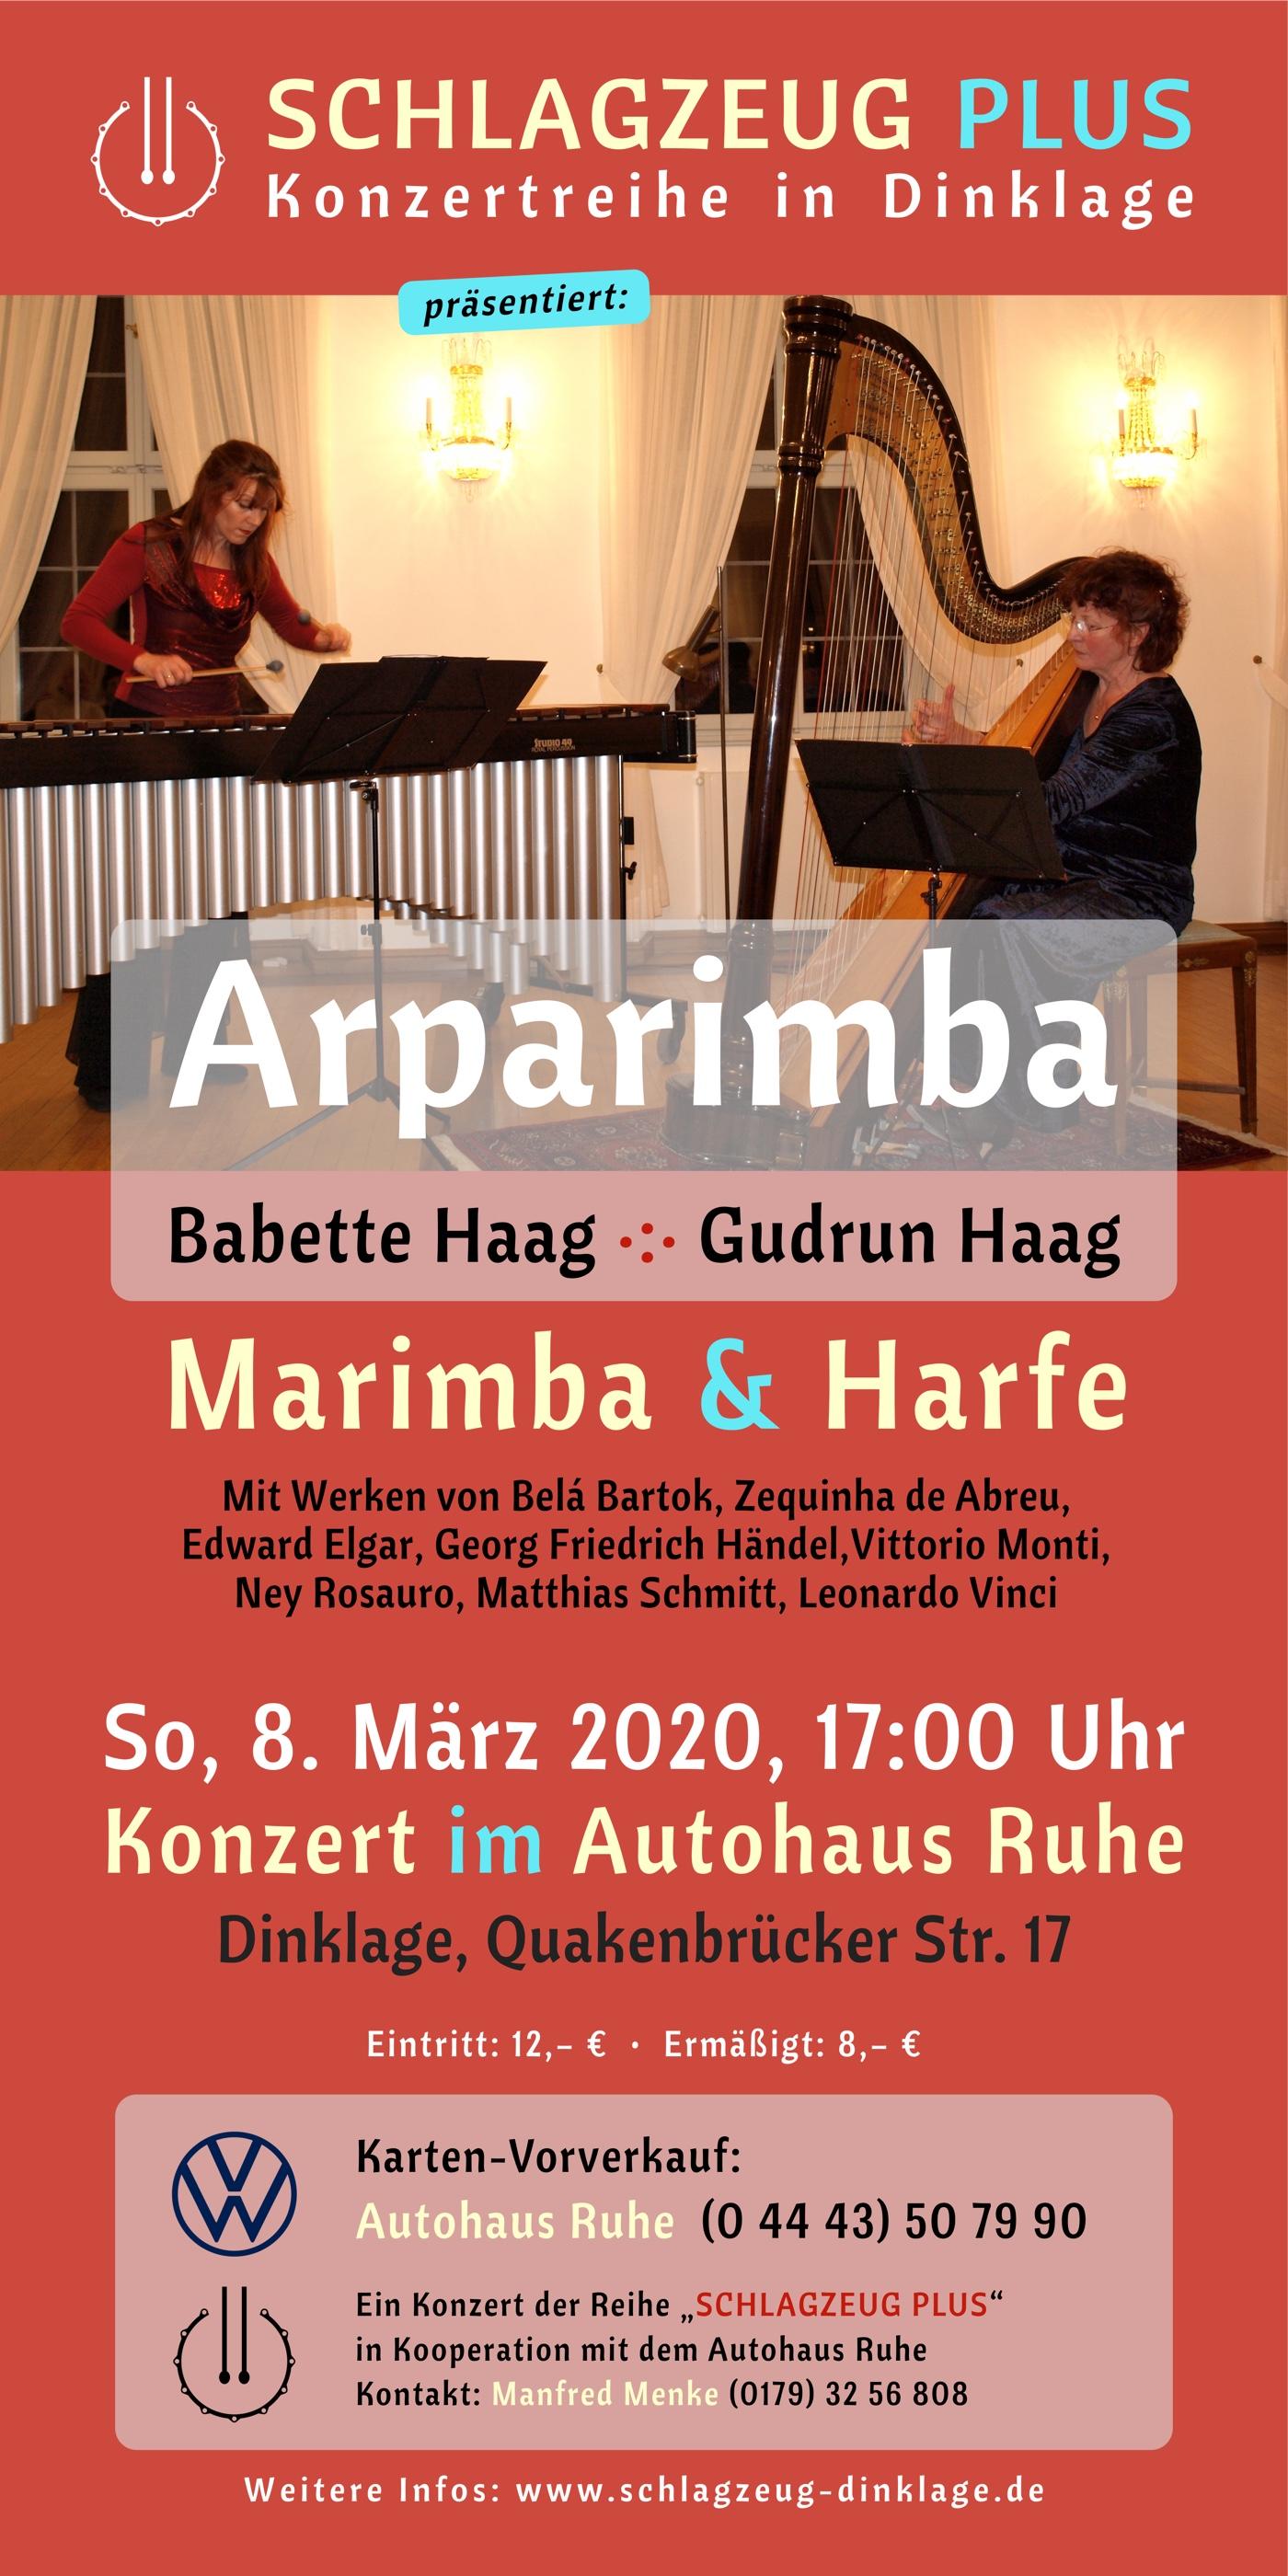 Arparimba · Duo mit Marimba und Harfe